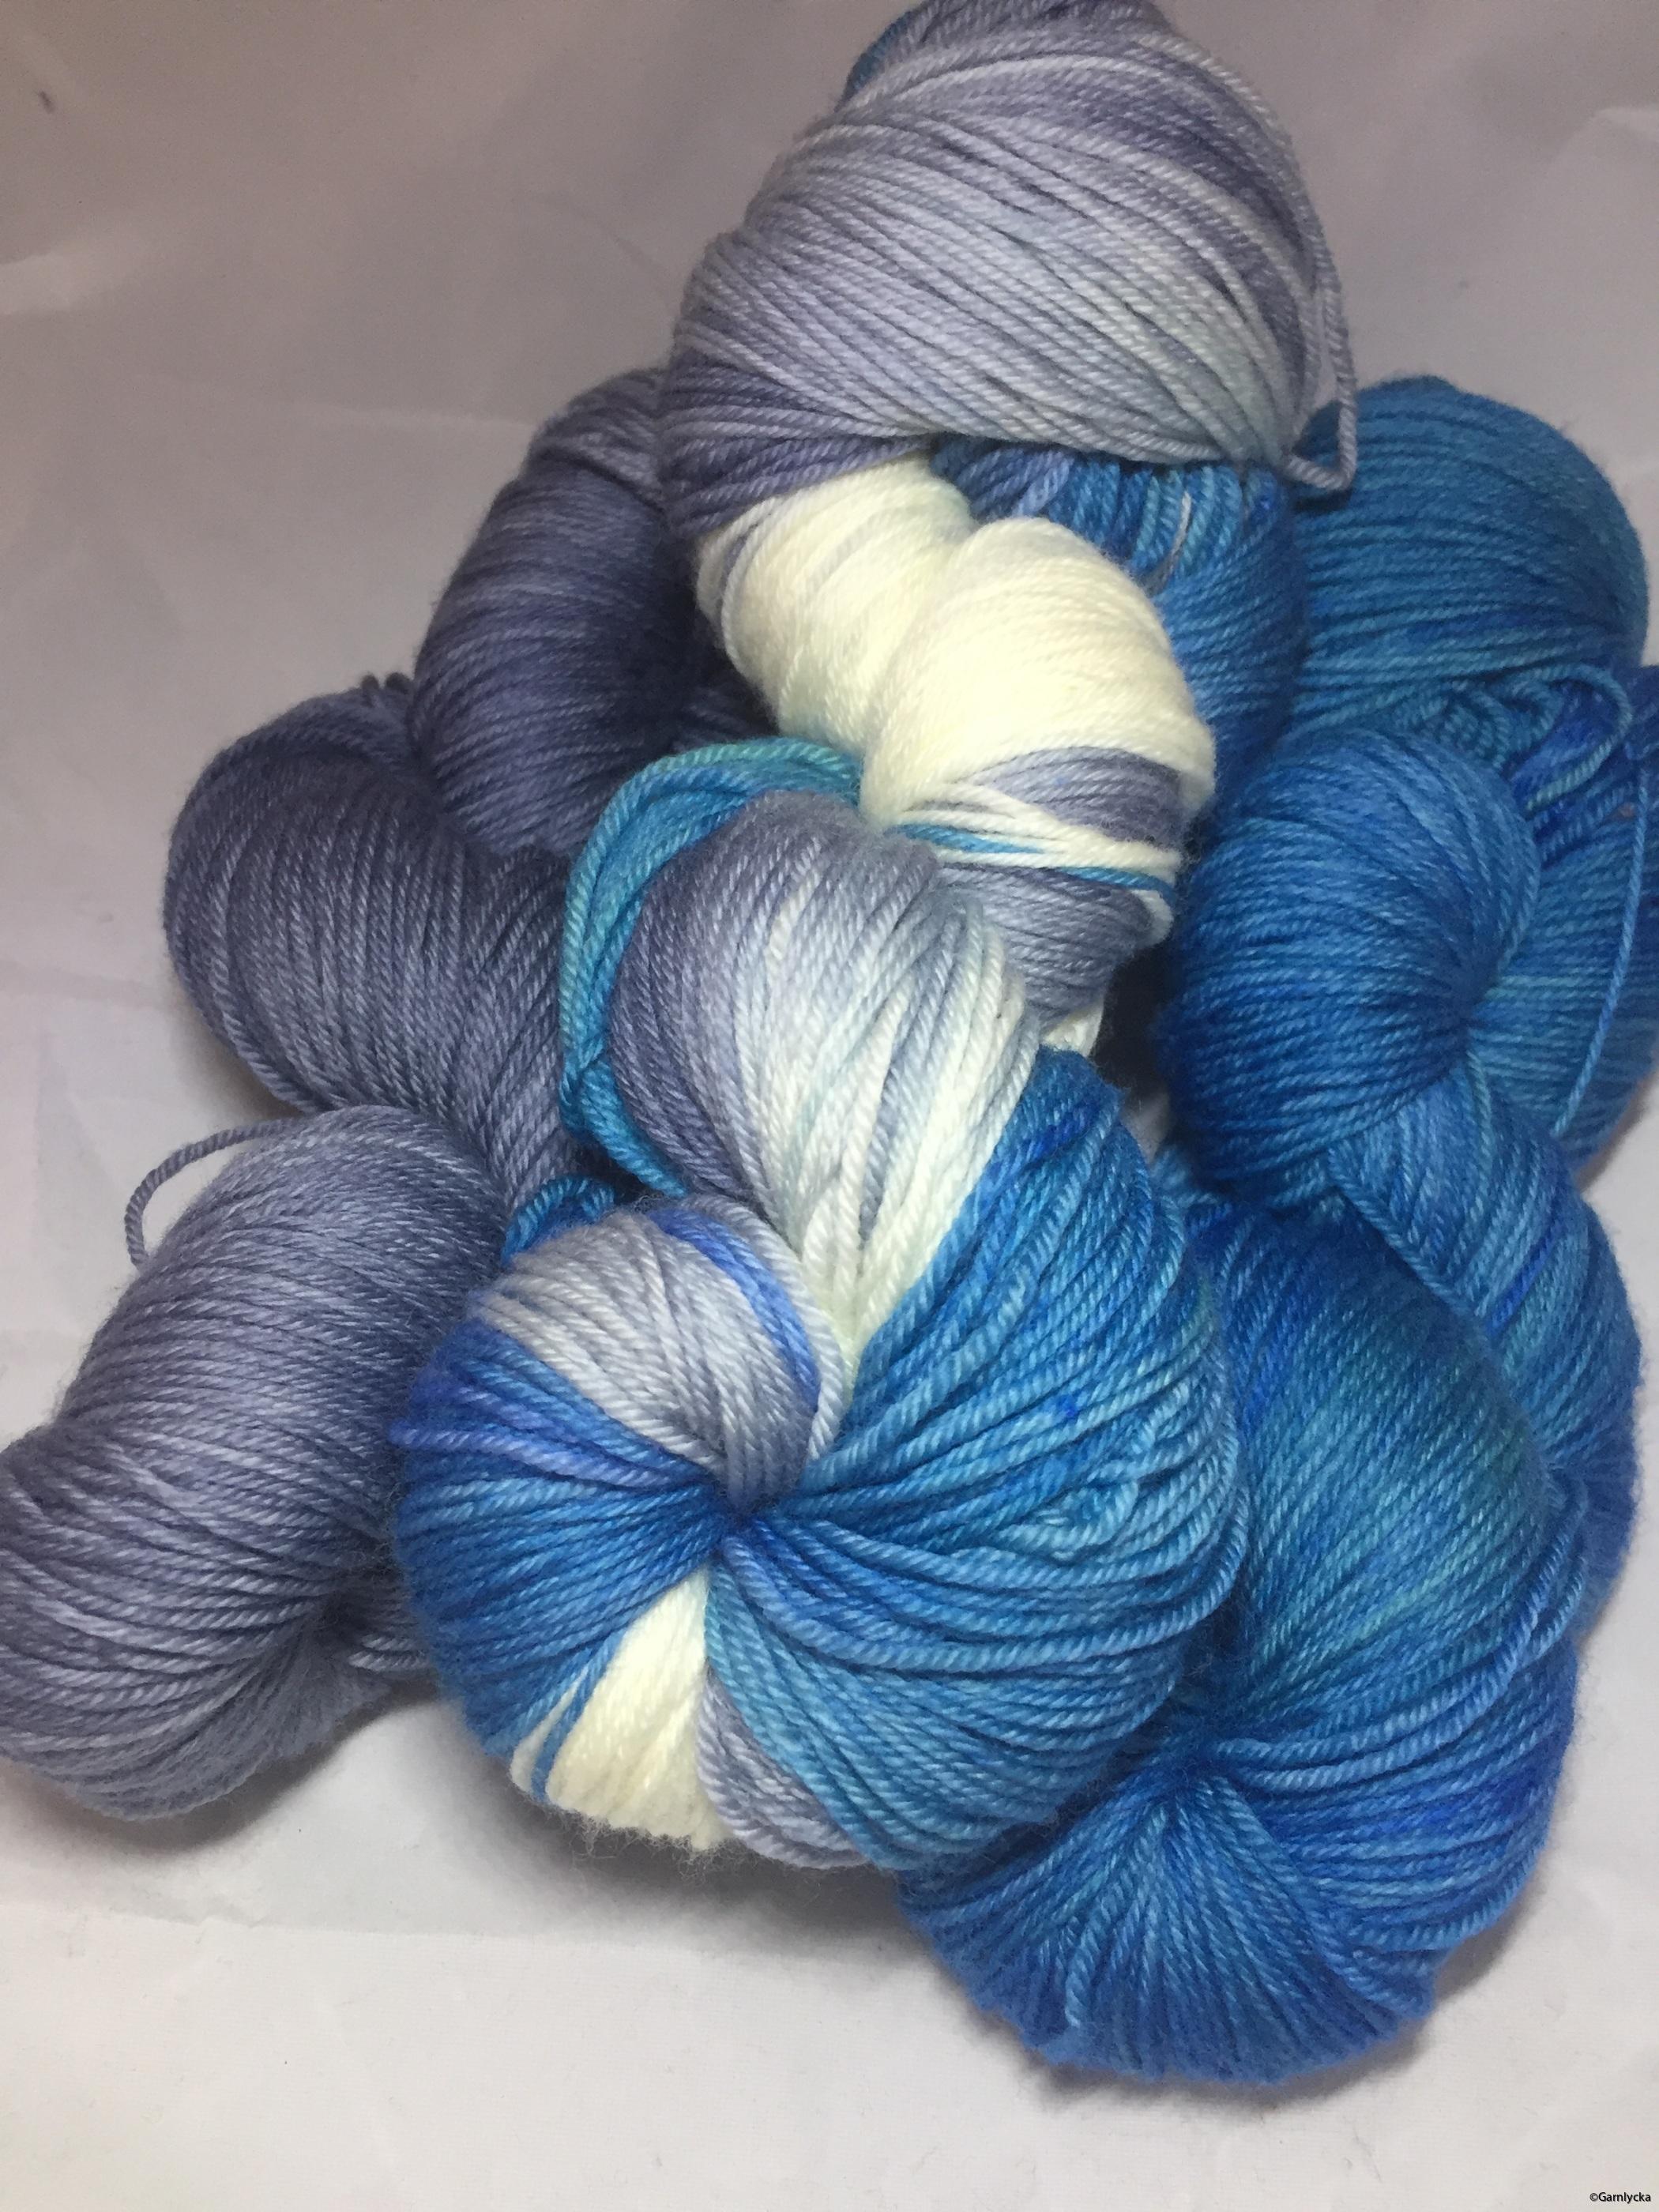 marin/vit/turkosblå